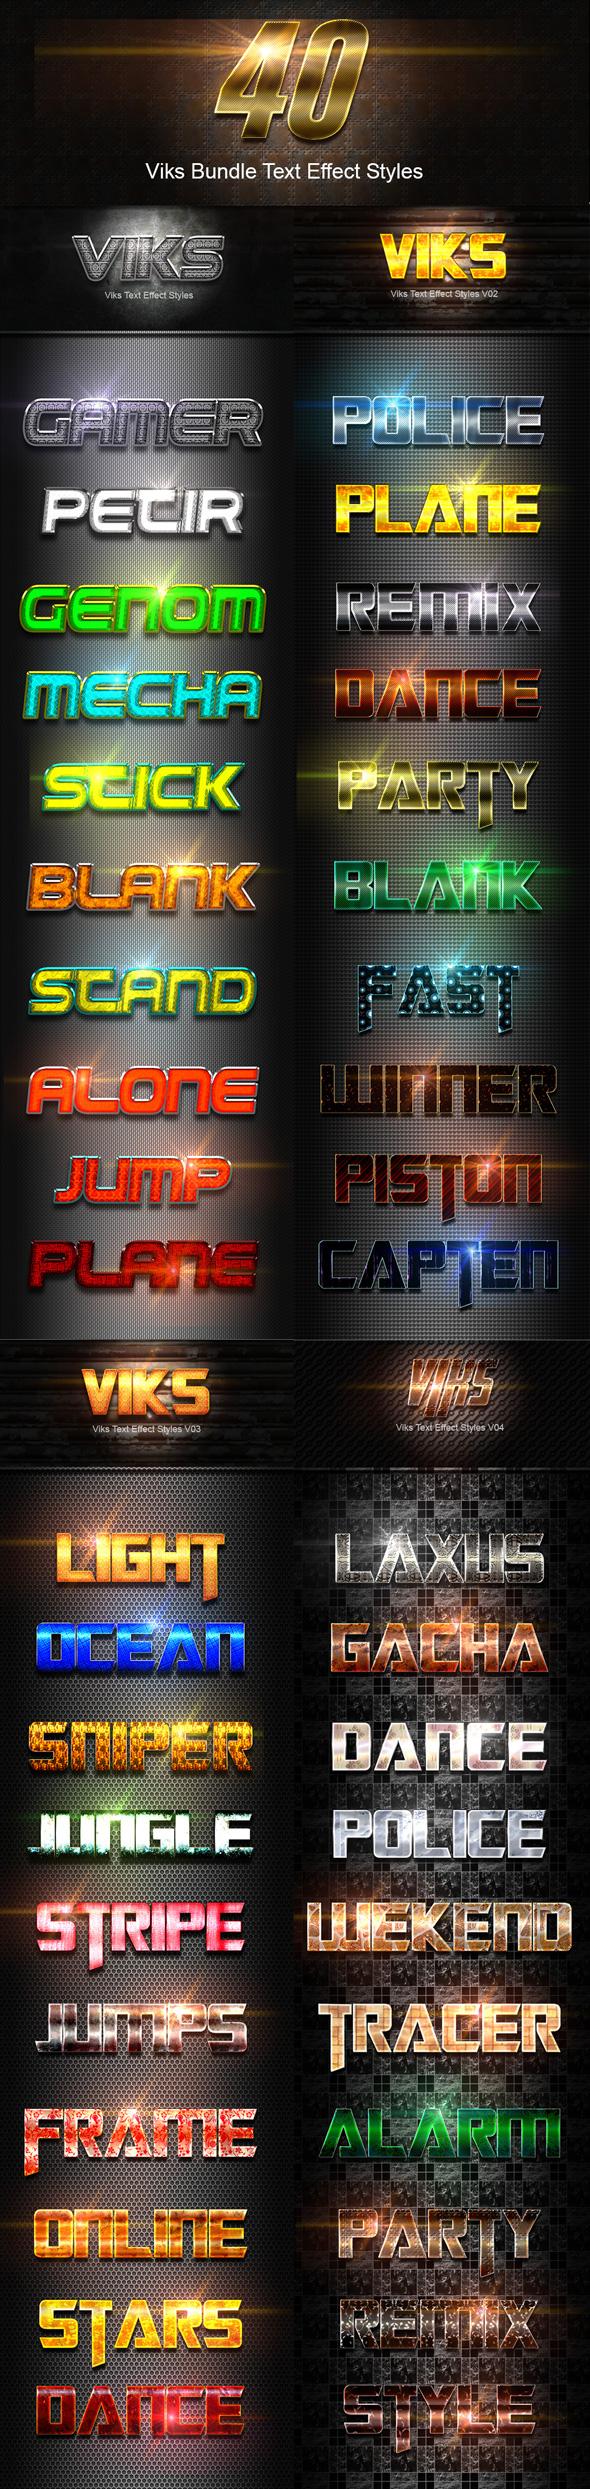 40 Viks Bundle Text Effect Styles - Text Effects Styles